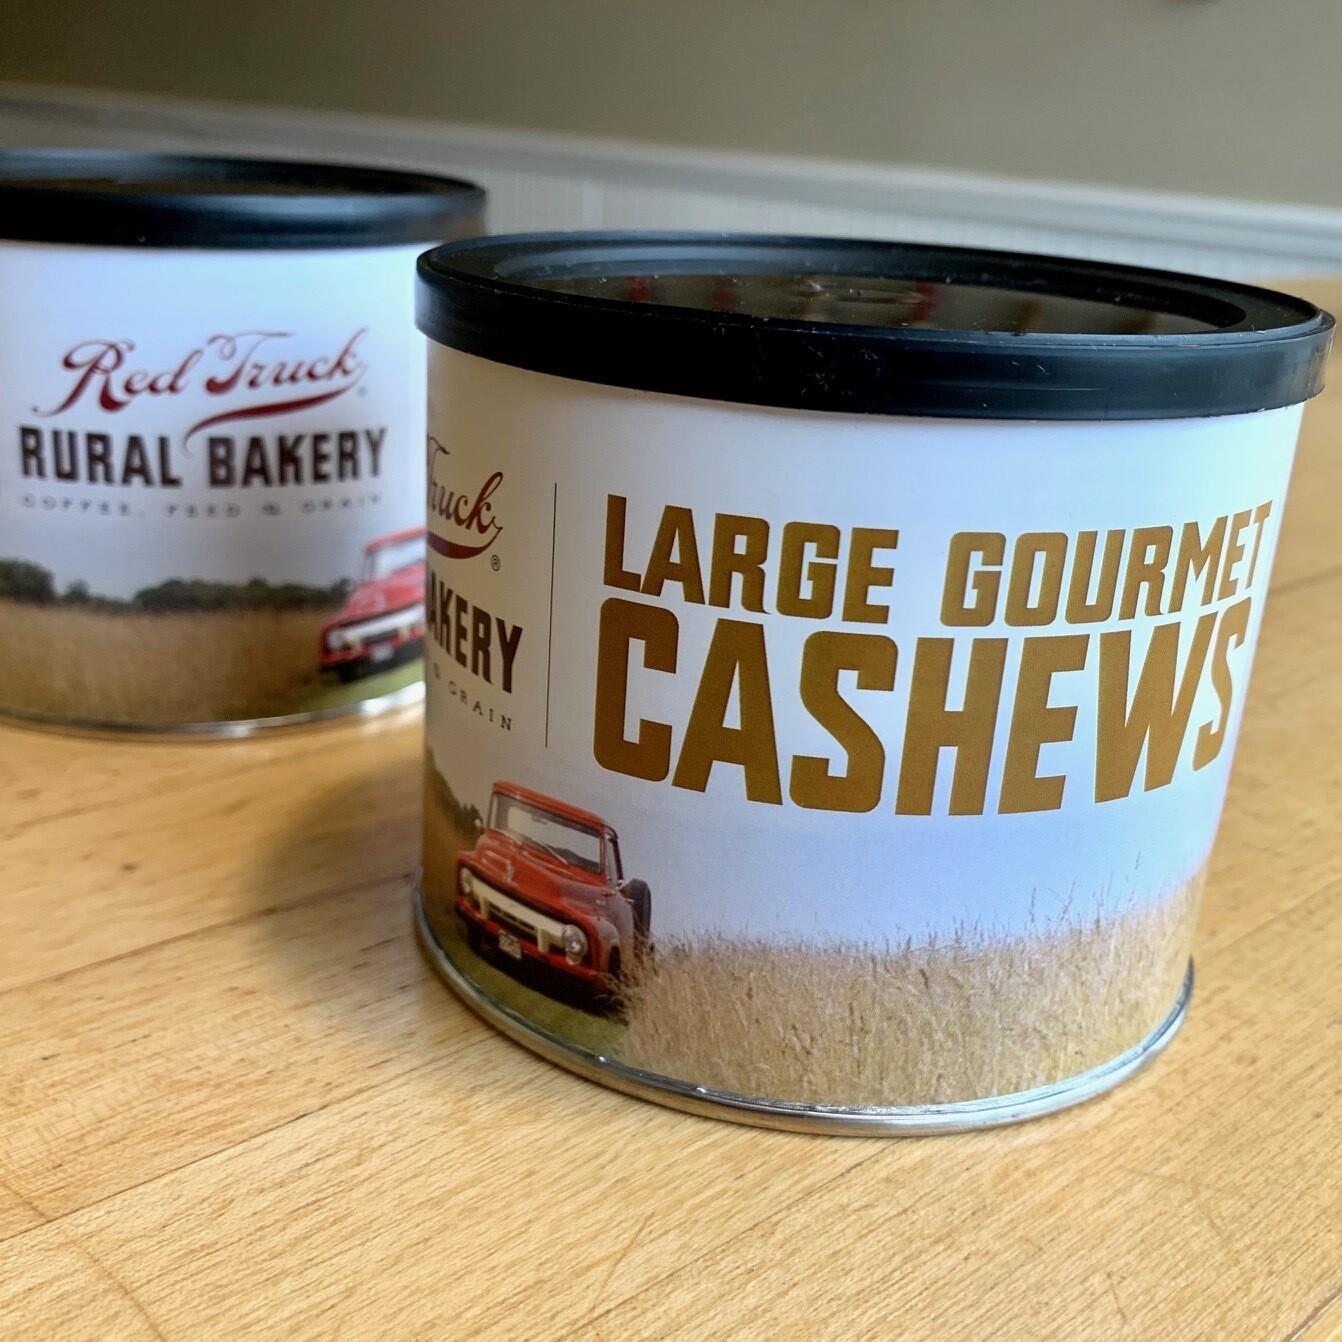 Nuts /cashews